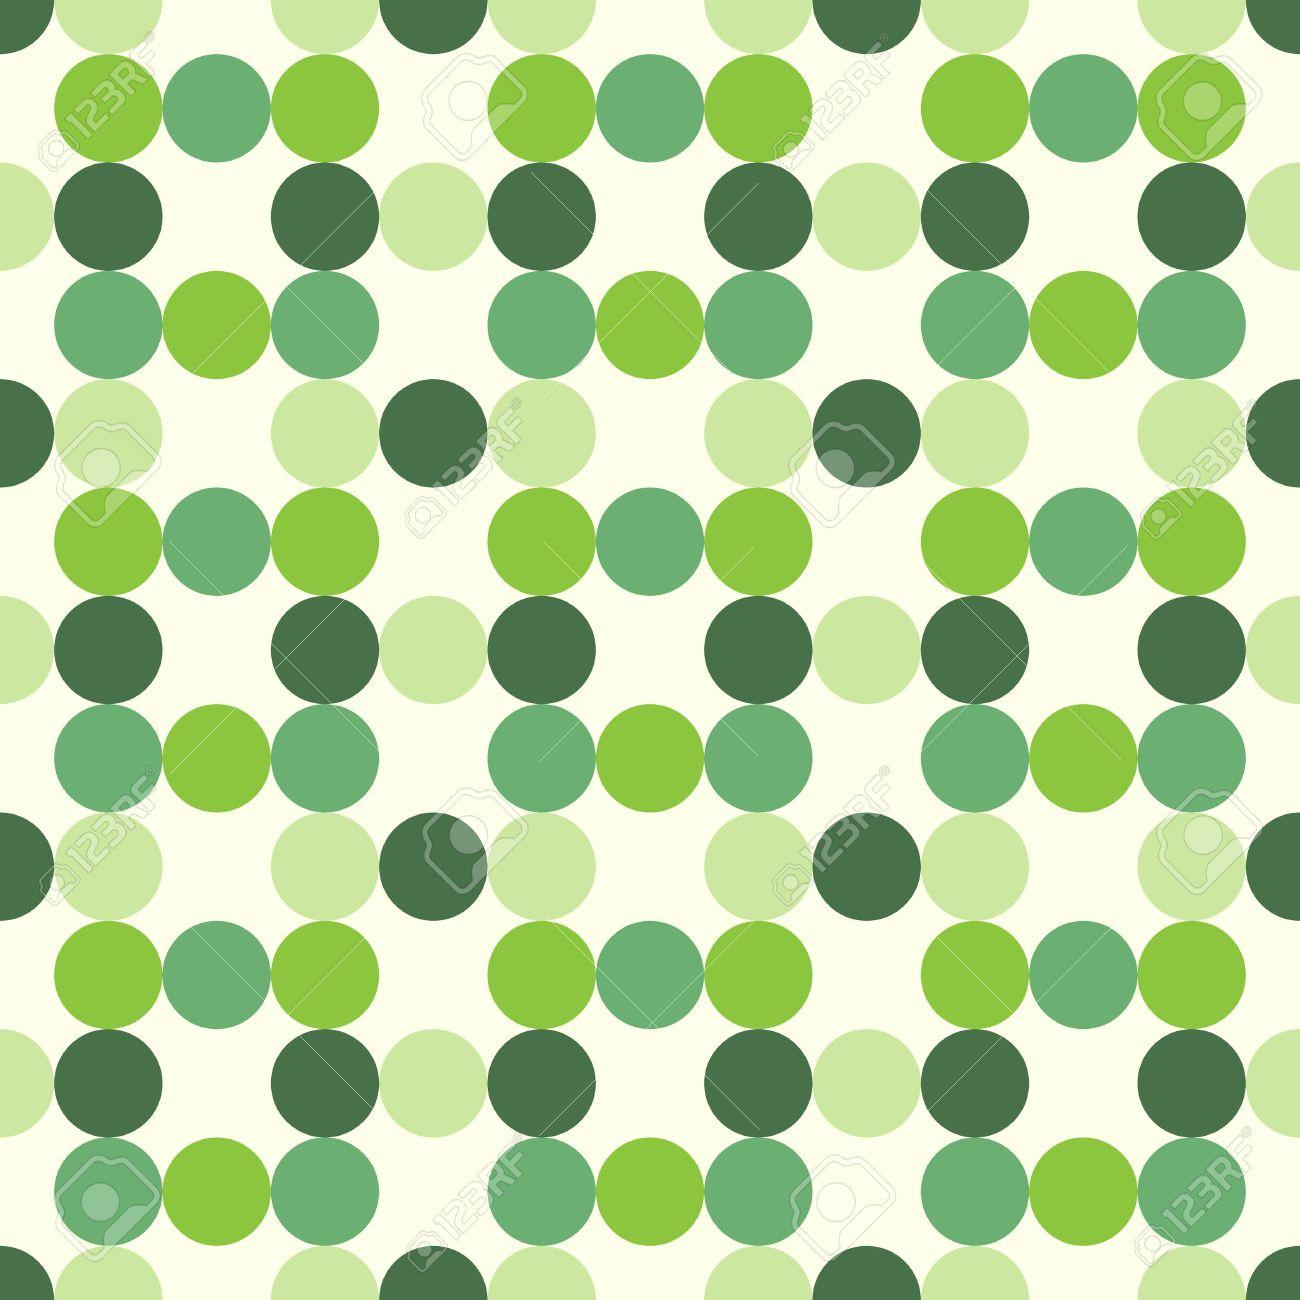 Circles of various tones, shades and tints of green, seamless pattern. EPS 8 vector illustration, no transparency - 49484855